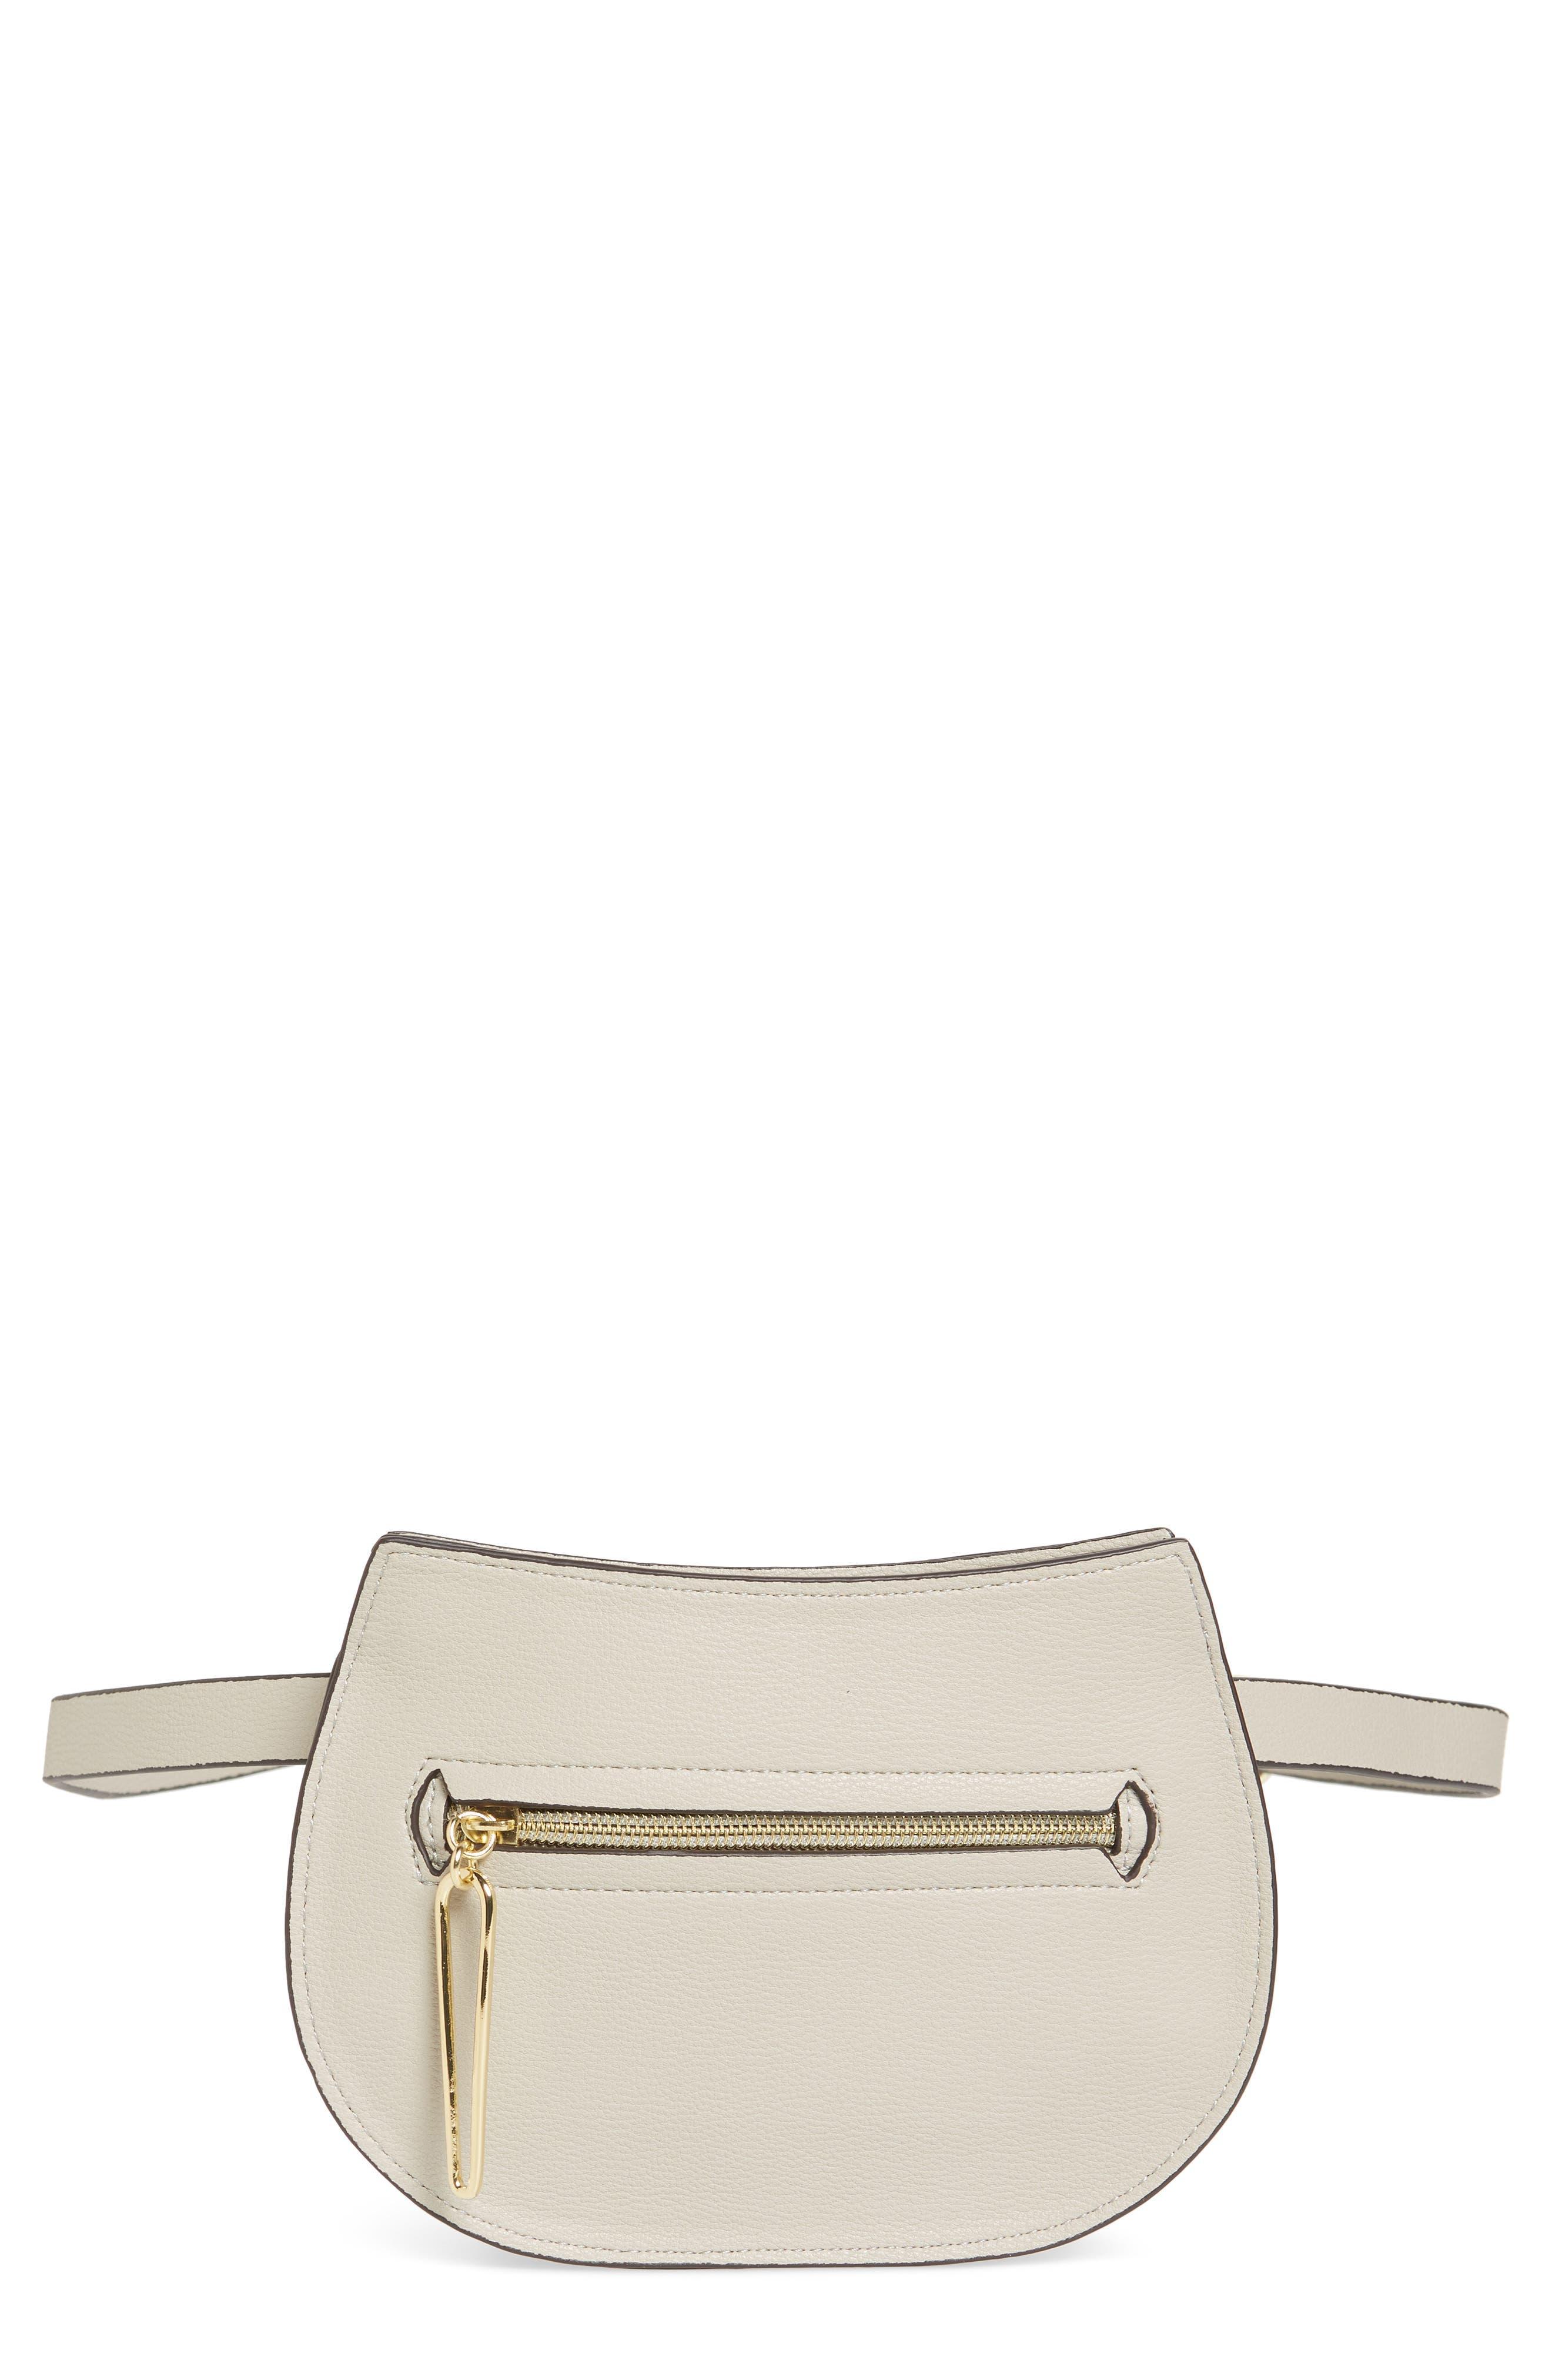 DANIELLE NICOLE Trish Faux Leather Belt Bag - Grey in Light Grey